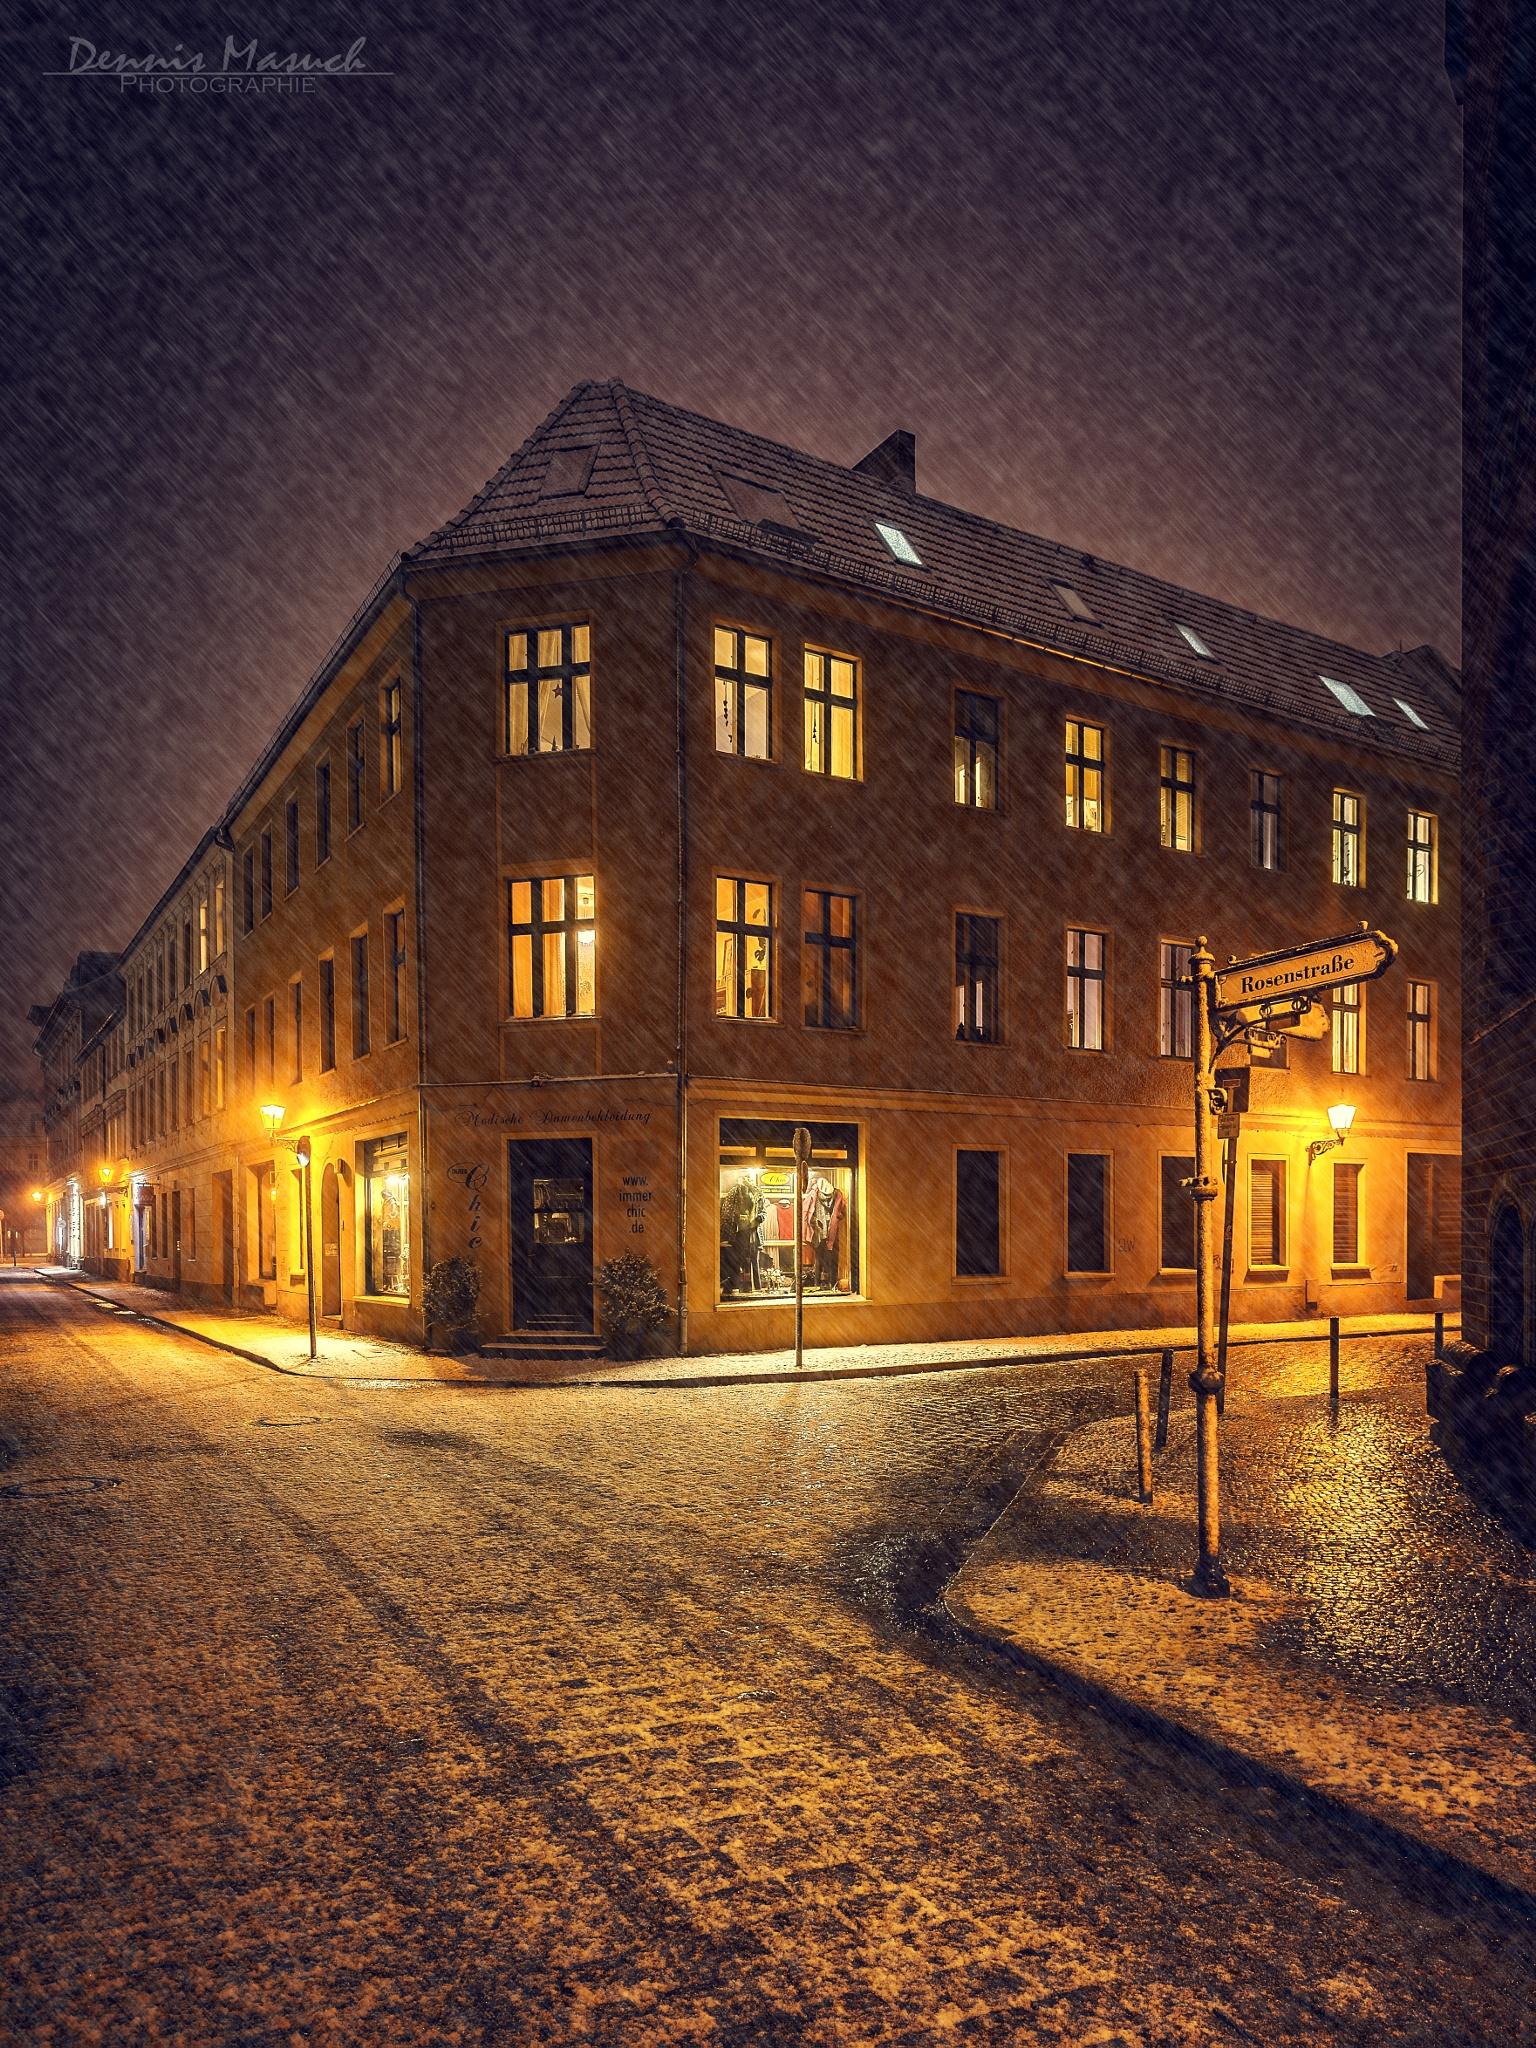 First Snow Berlin Köpenick by Dennis Masuch